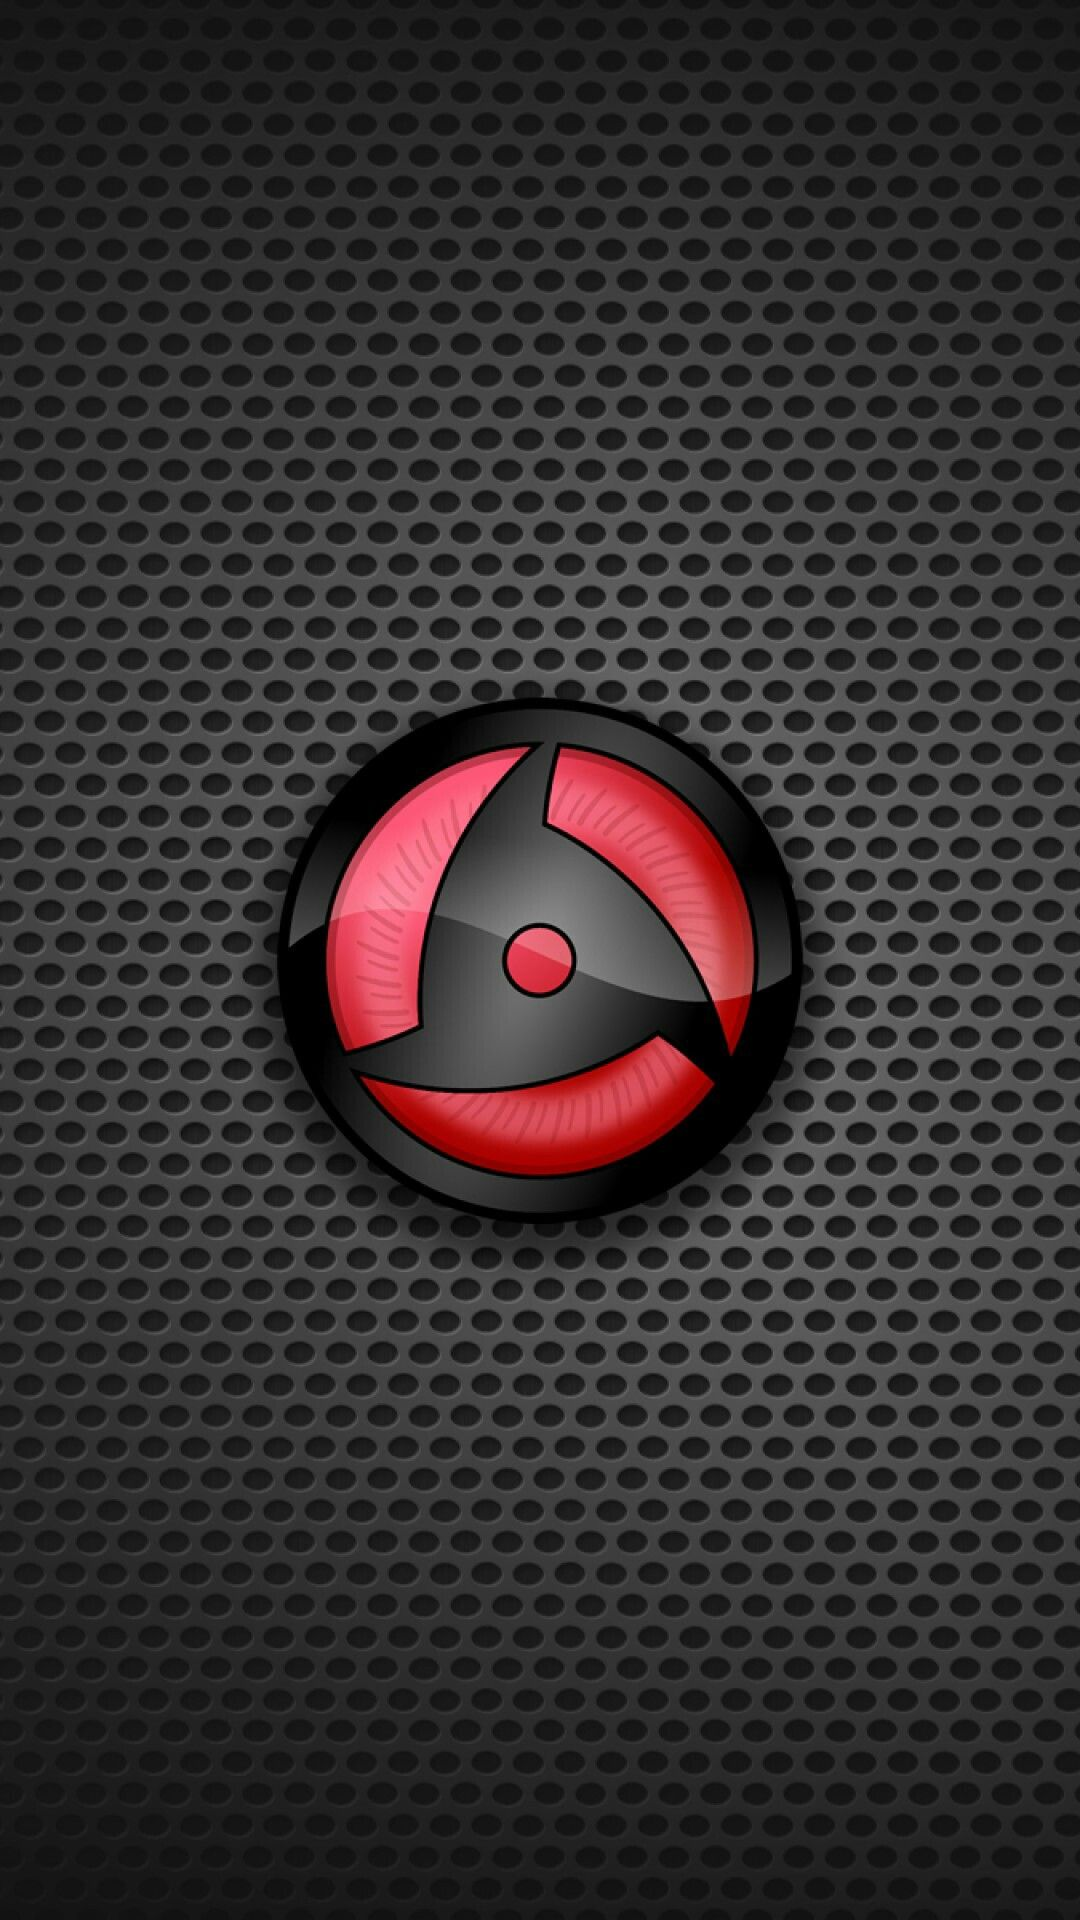 sharingan wallpaper phone - HD1080×1920